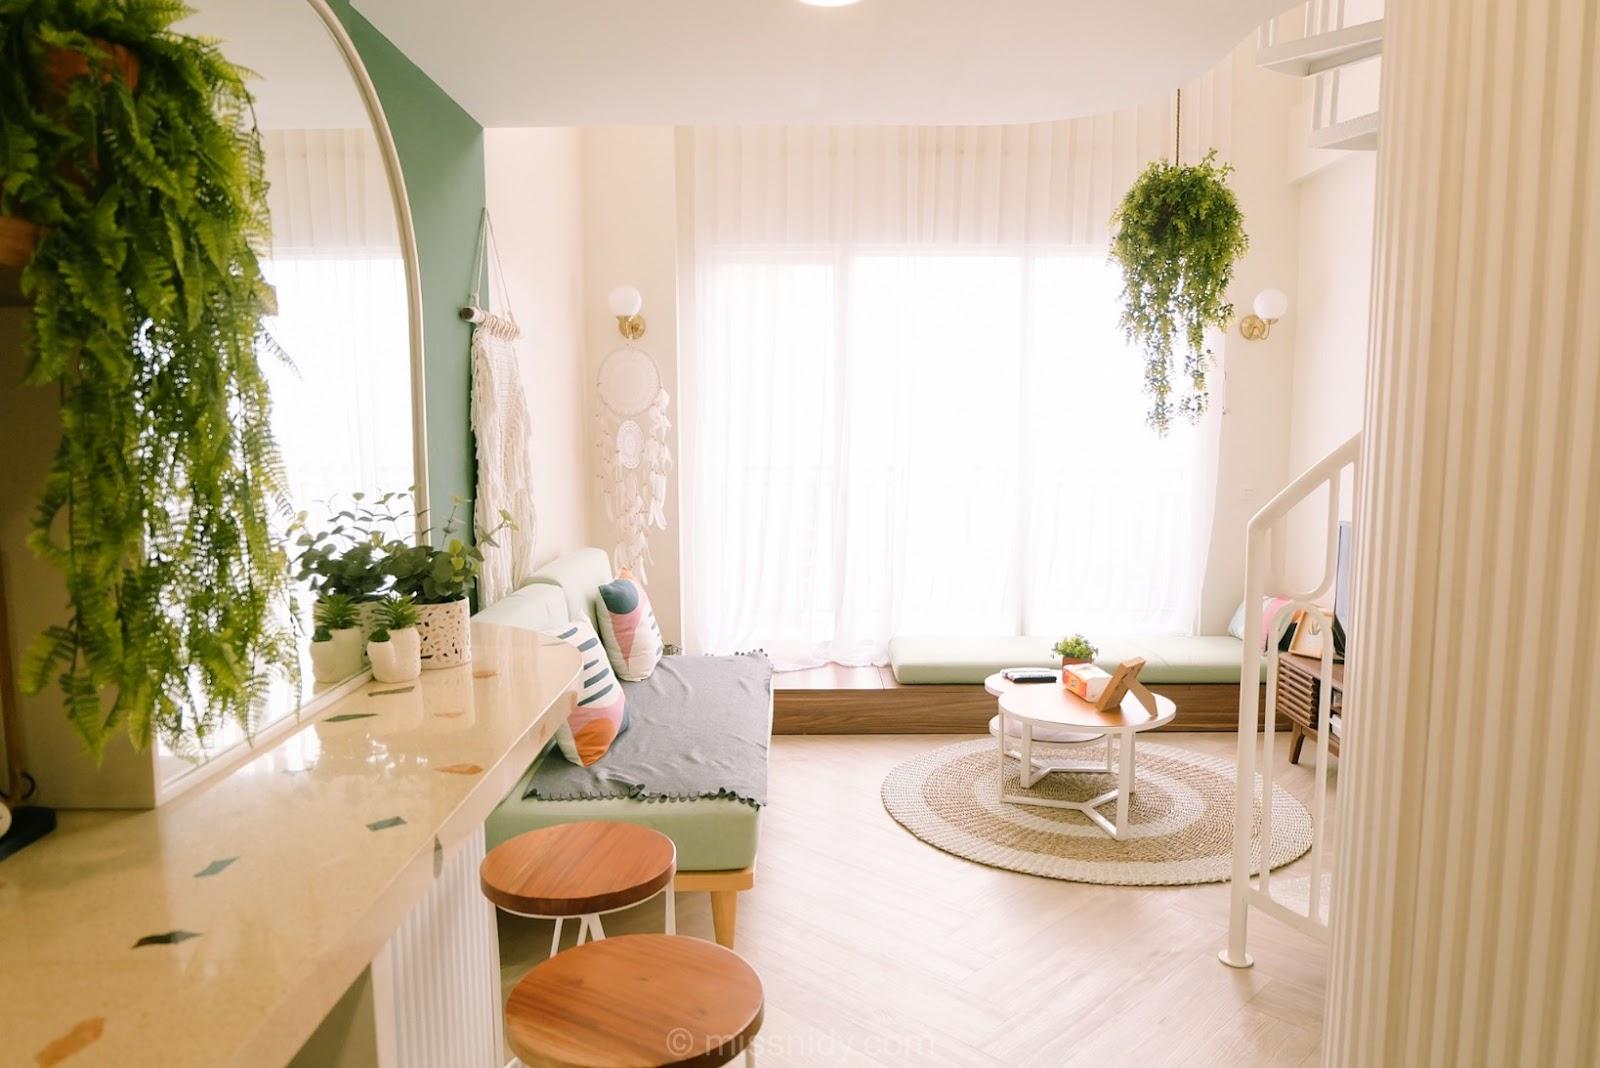 airbnb instagramable bandung murah